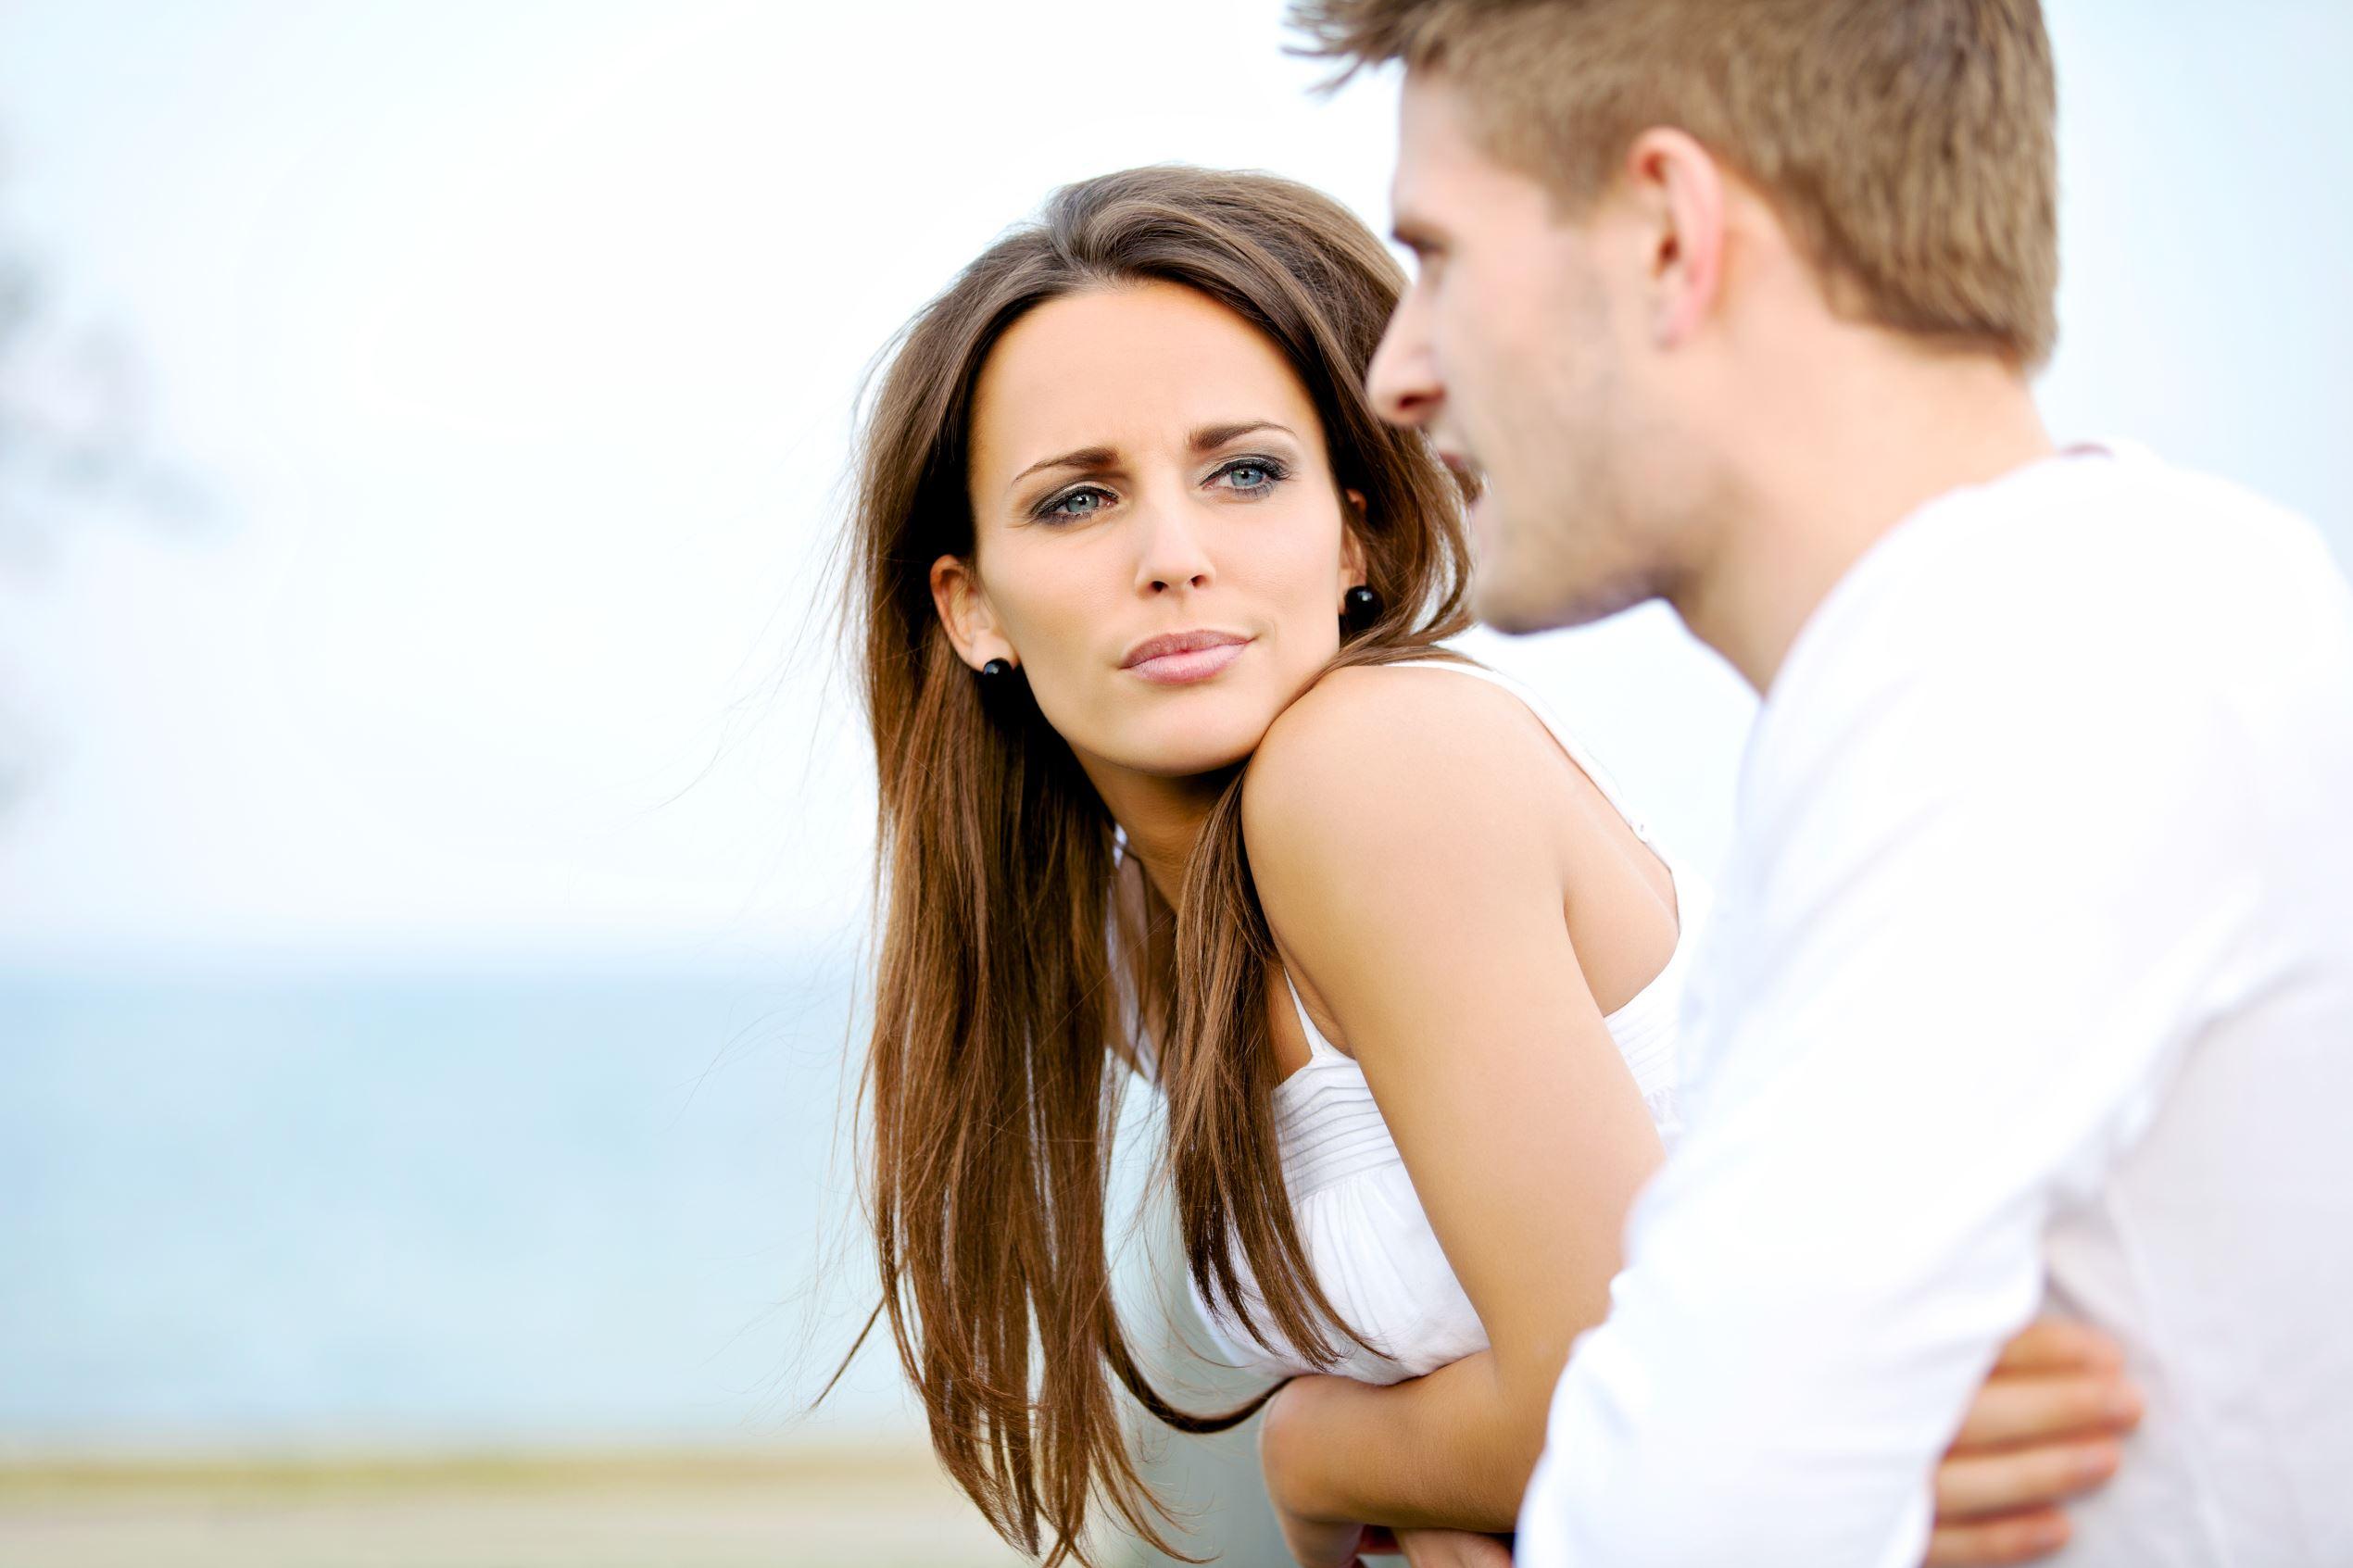 Waking life latino dating